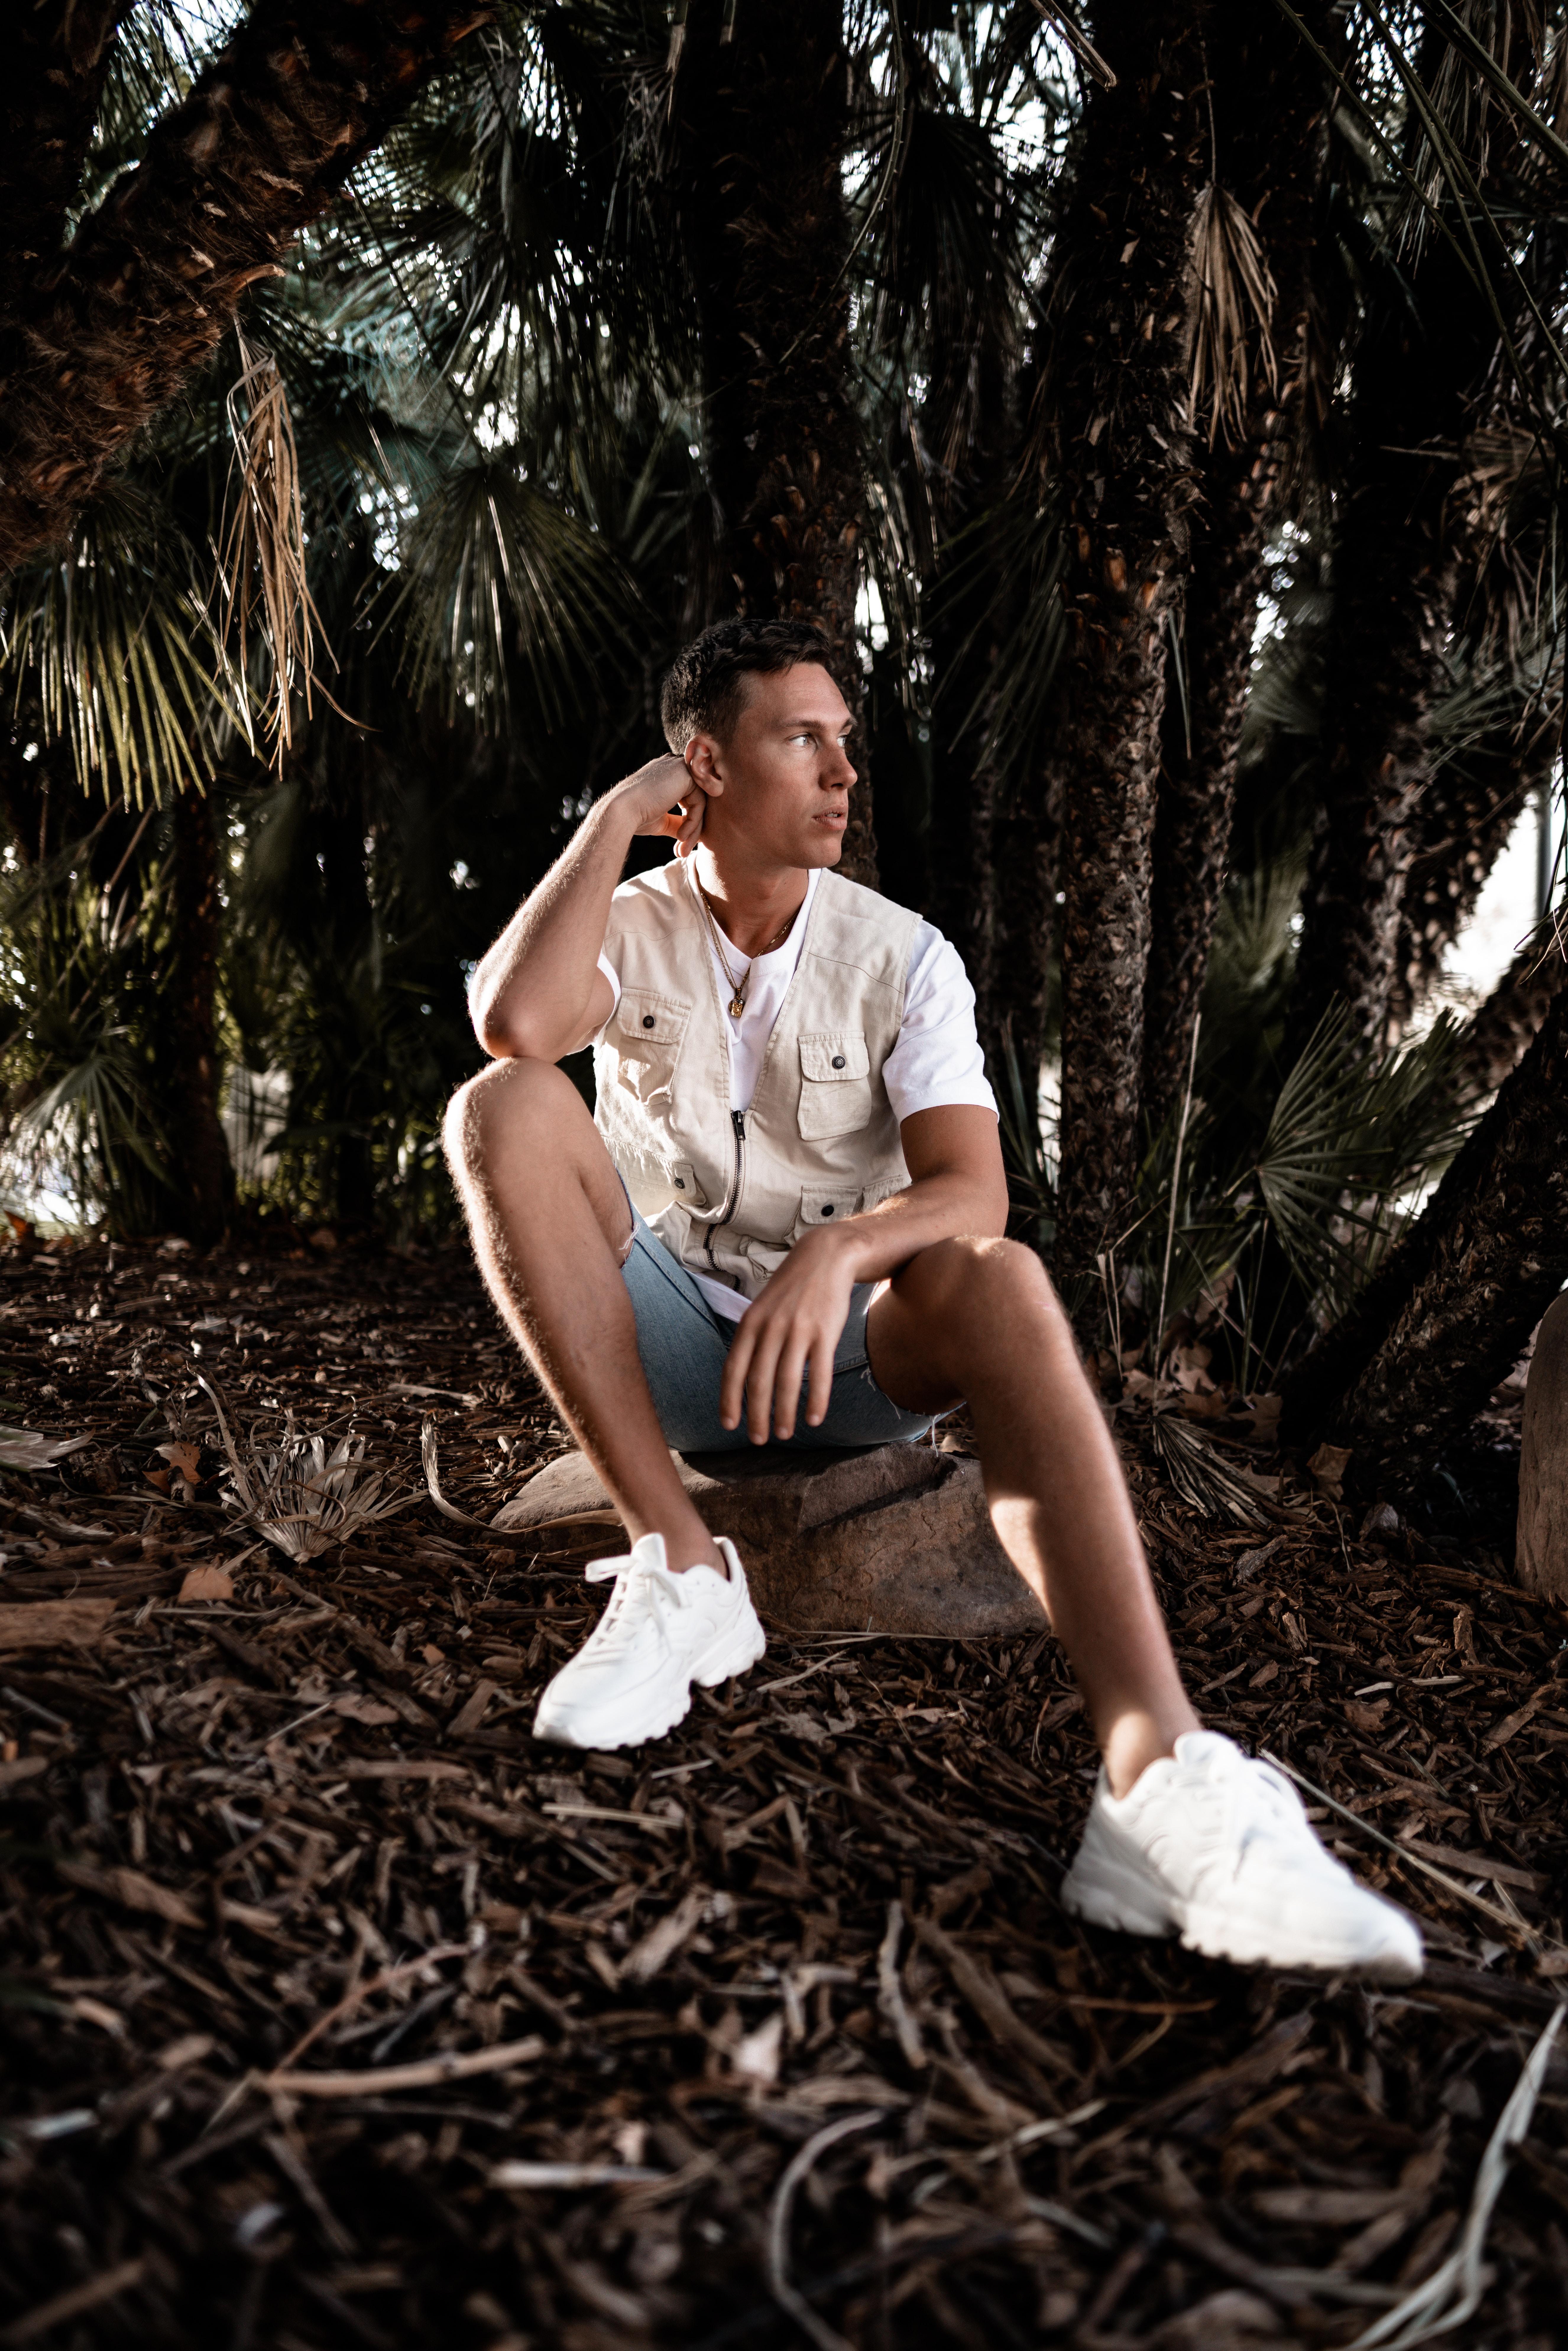 man sitting on rock beside palm trees